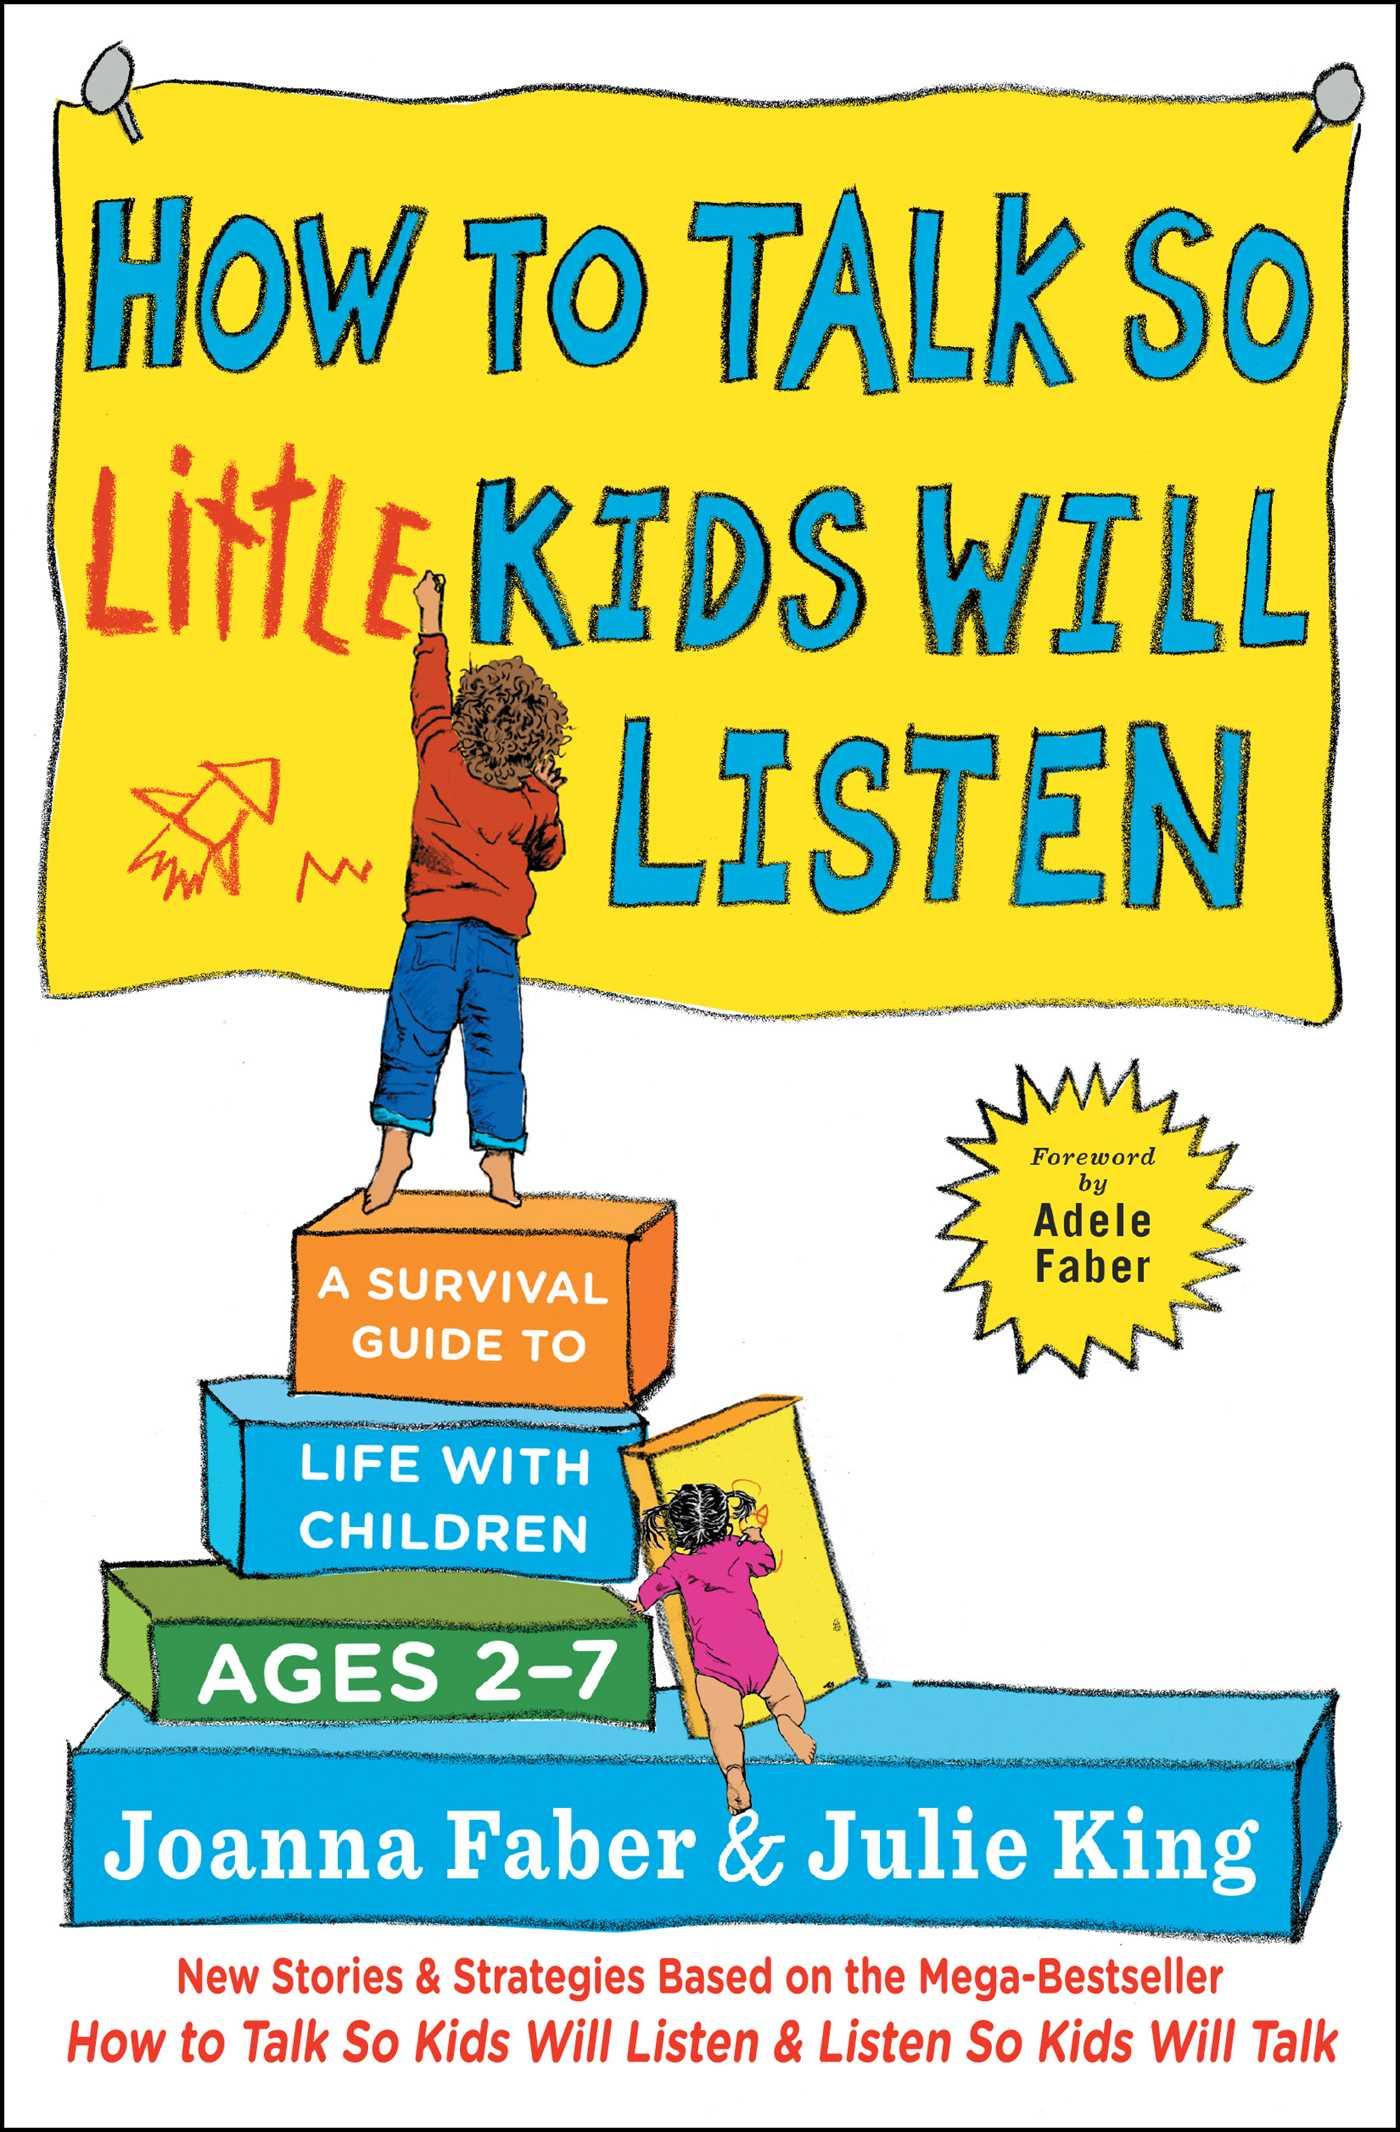 listen to a talk_How to Talk so Little Kids Will Listen | Book by Joanna Faber, Julie King | Official ...